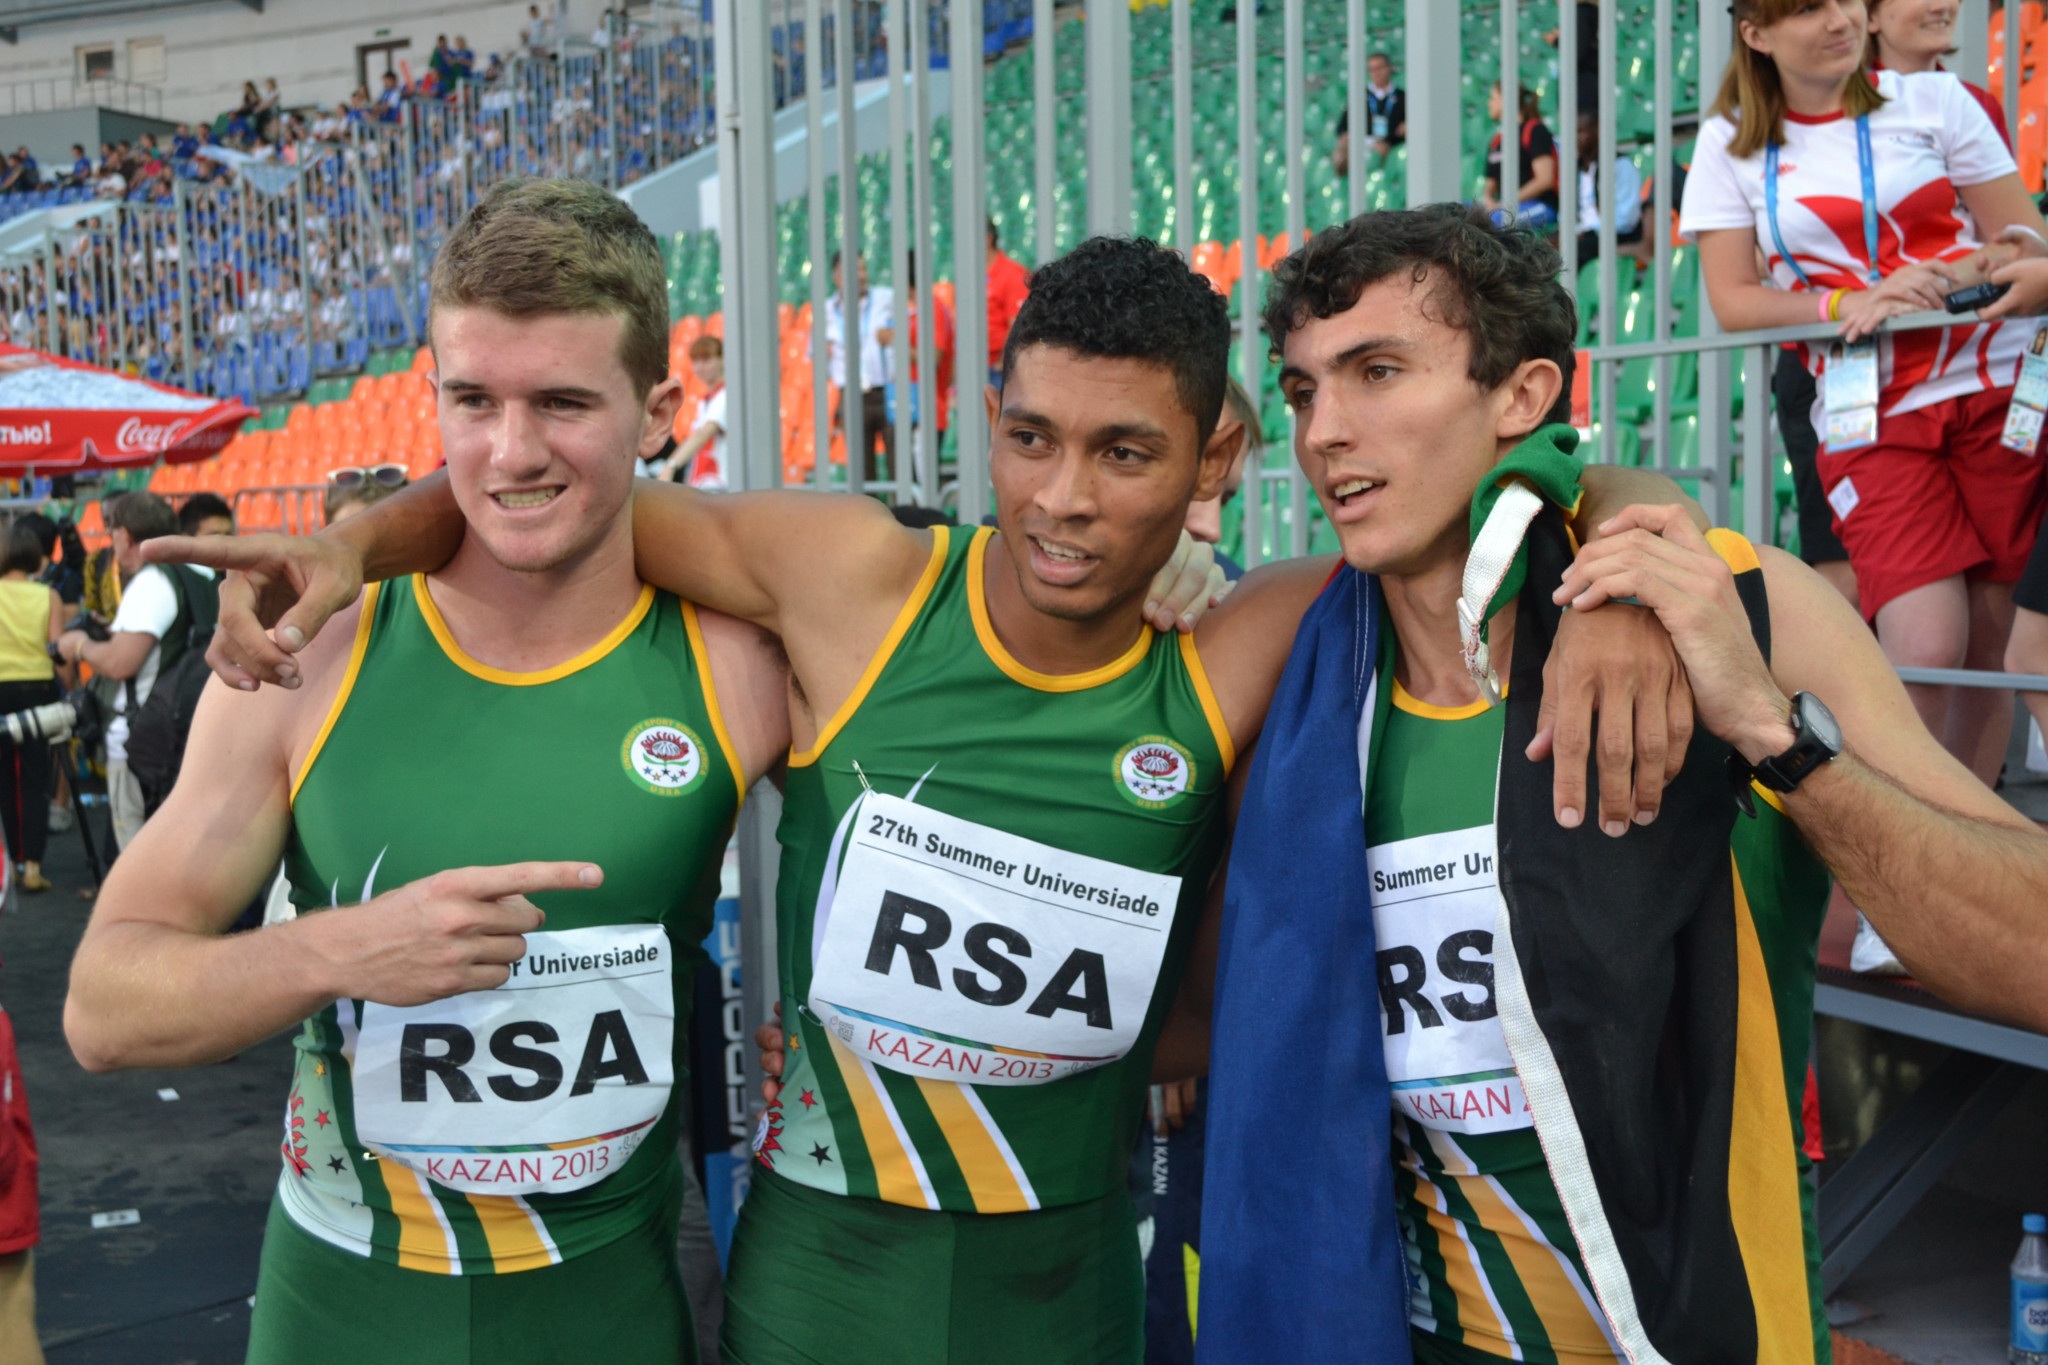 South Africa's van Niekerk claims Summer Universiade was platform for international success